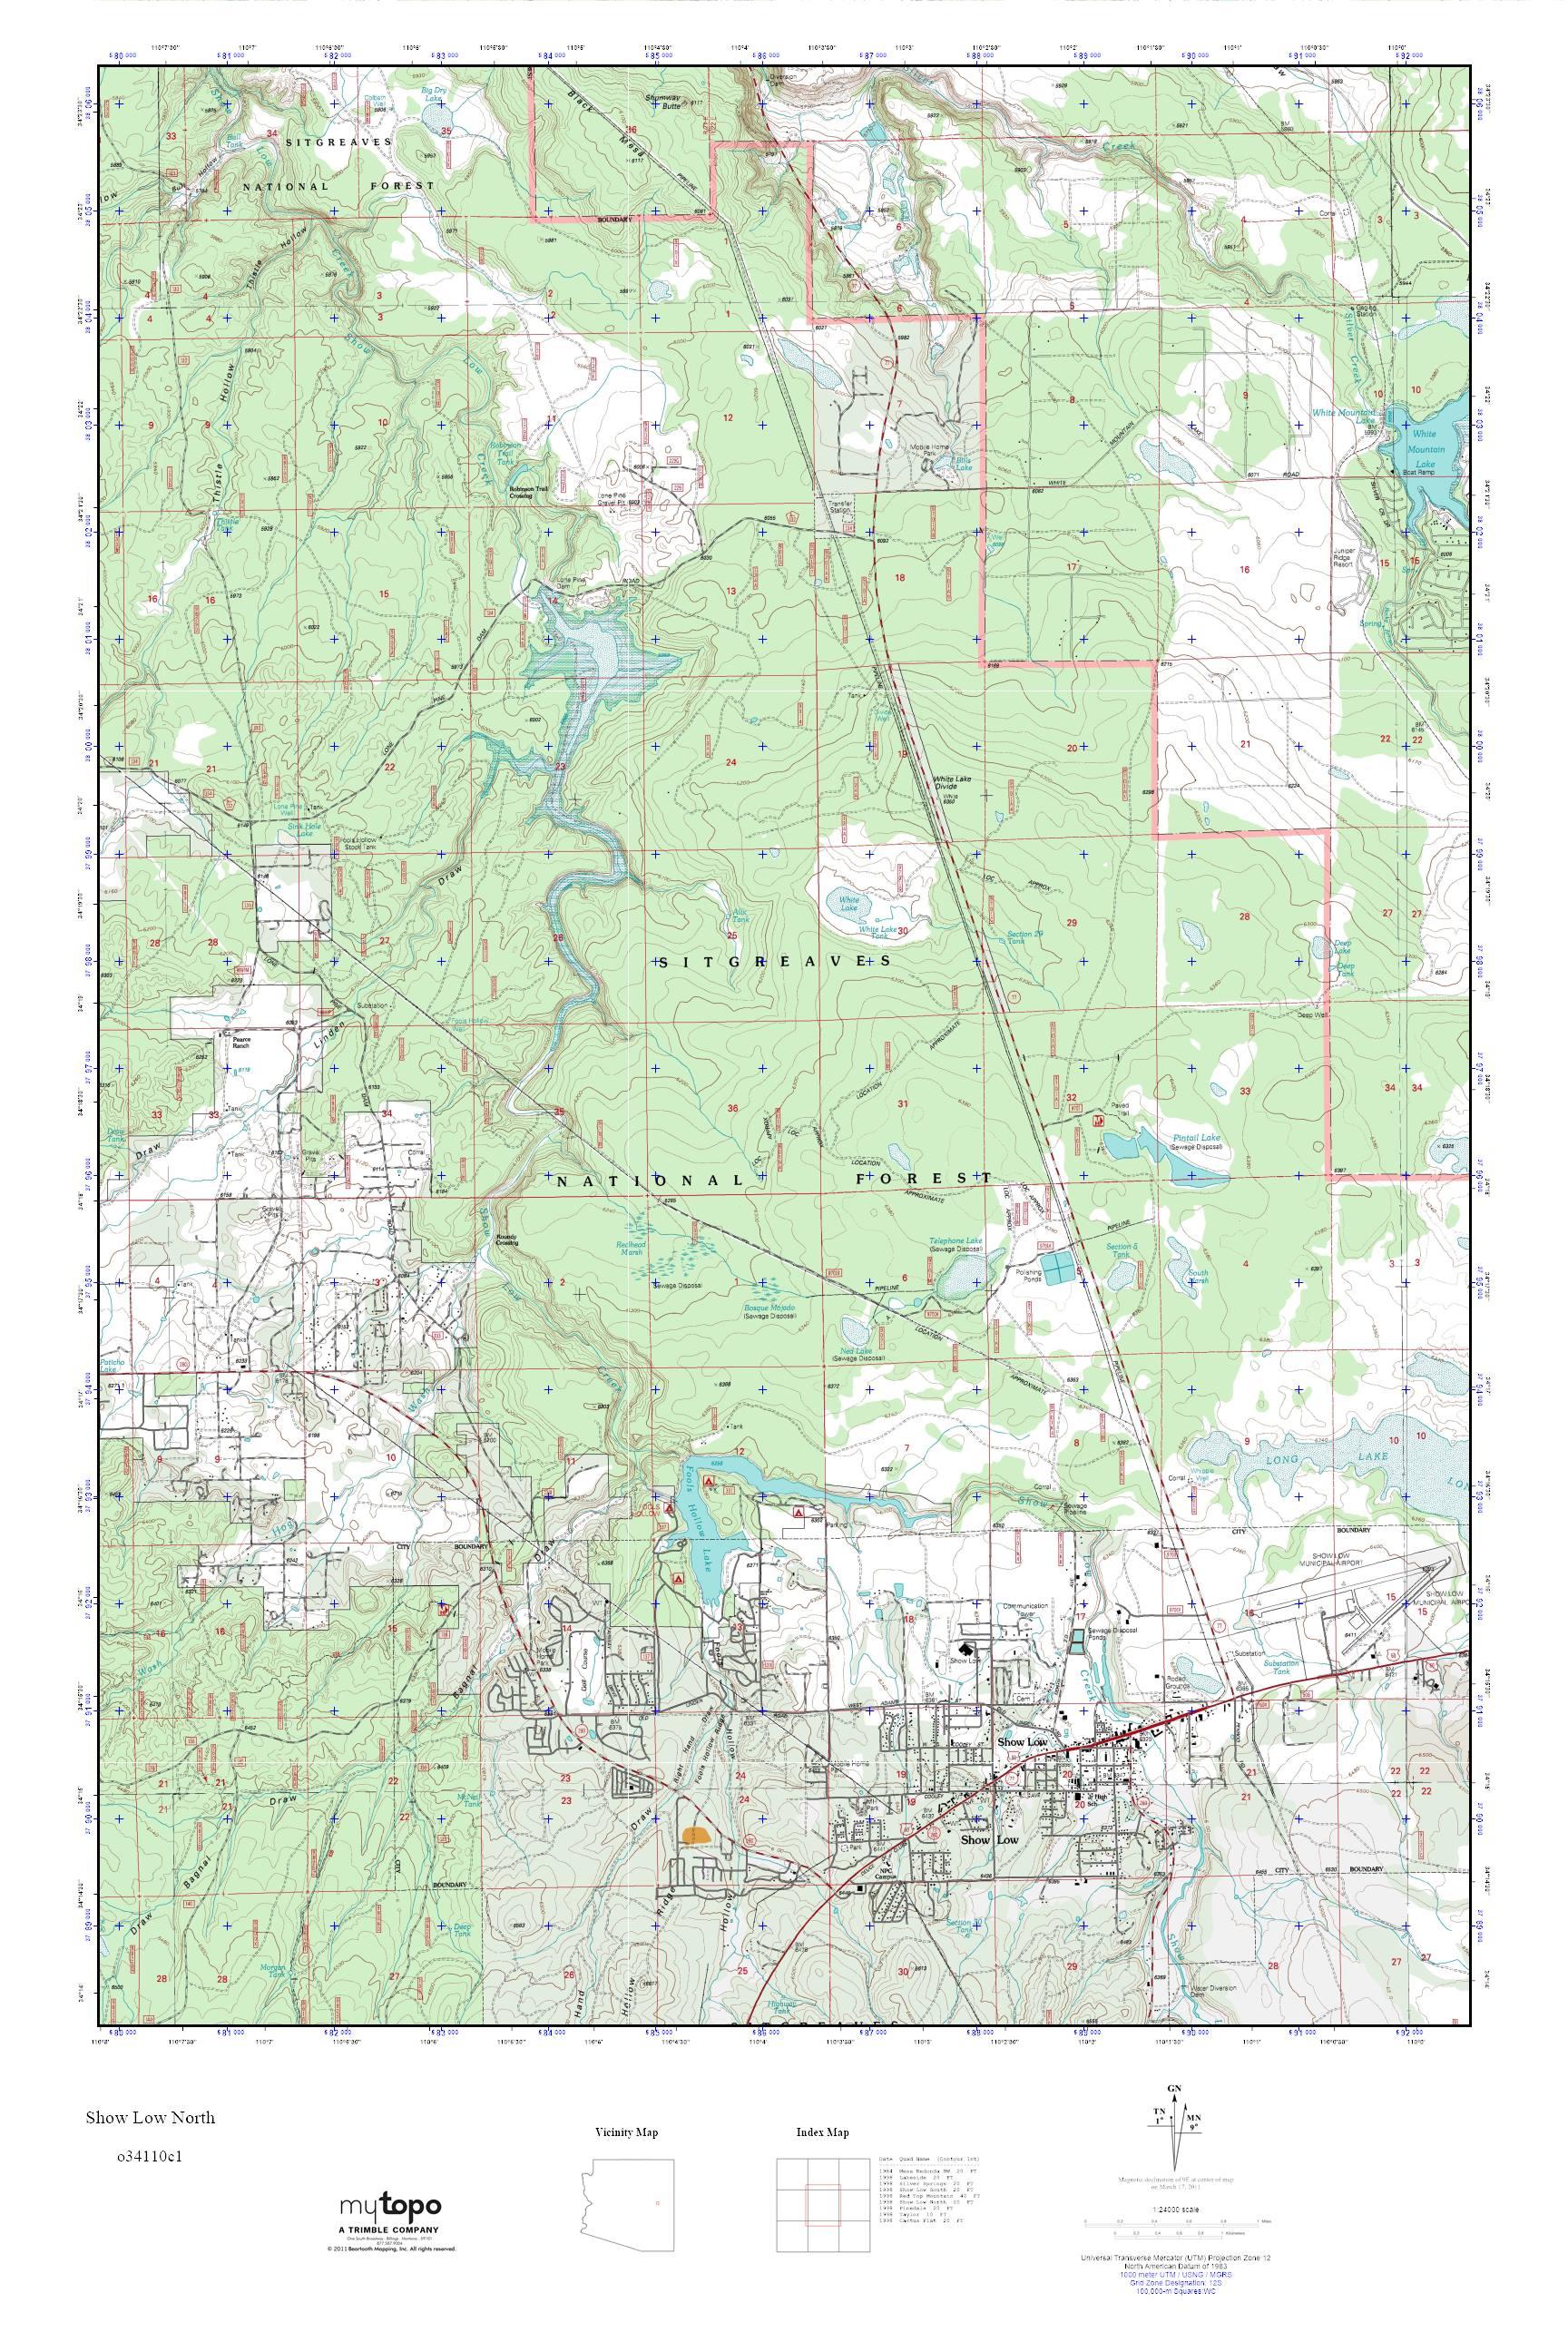 North Arizona Map.Mytopo Show Low North Arizona Usgs Quad Topo Map